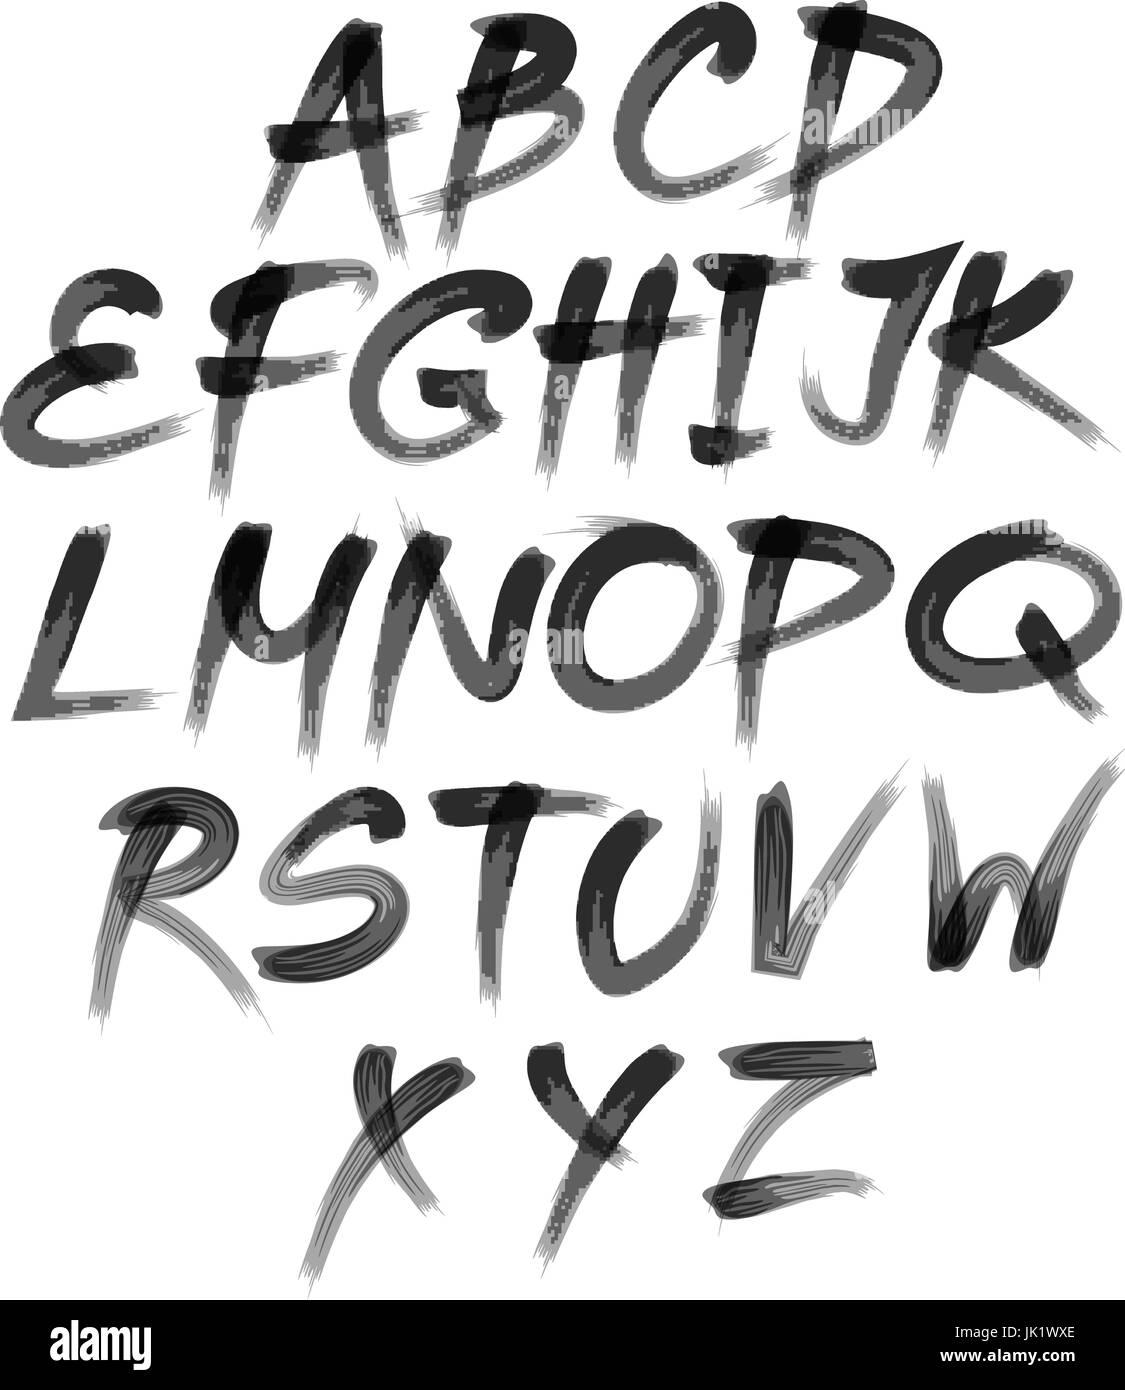 Alphabet Letters Spray Paint Abc Stock Photos Alphabet